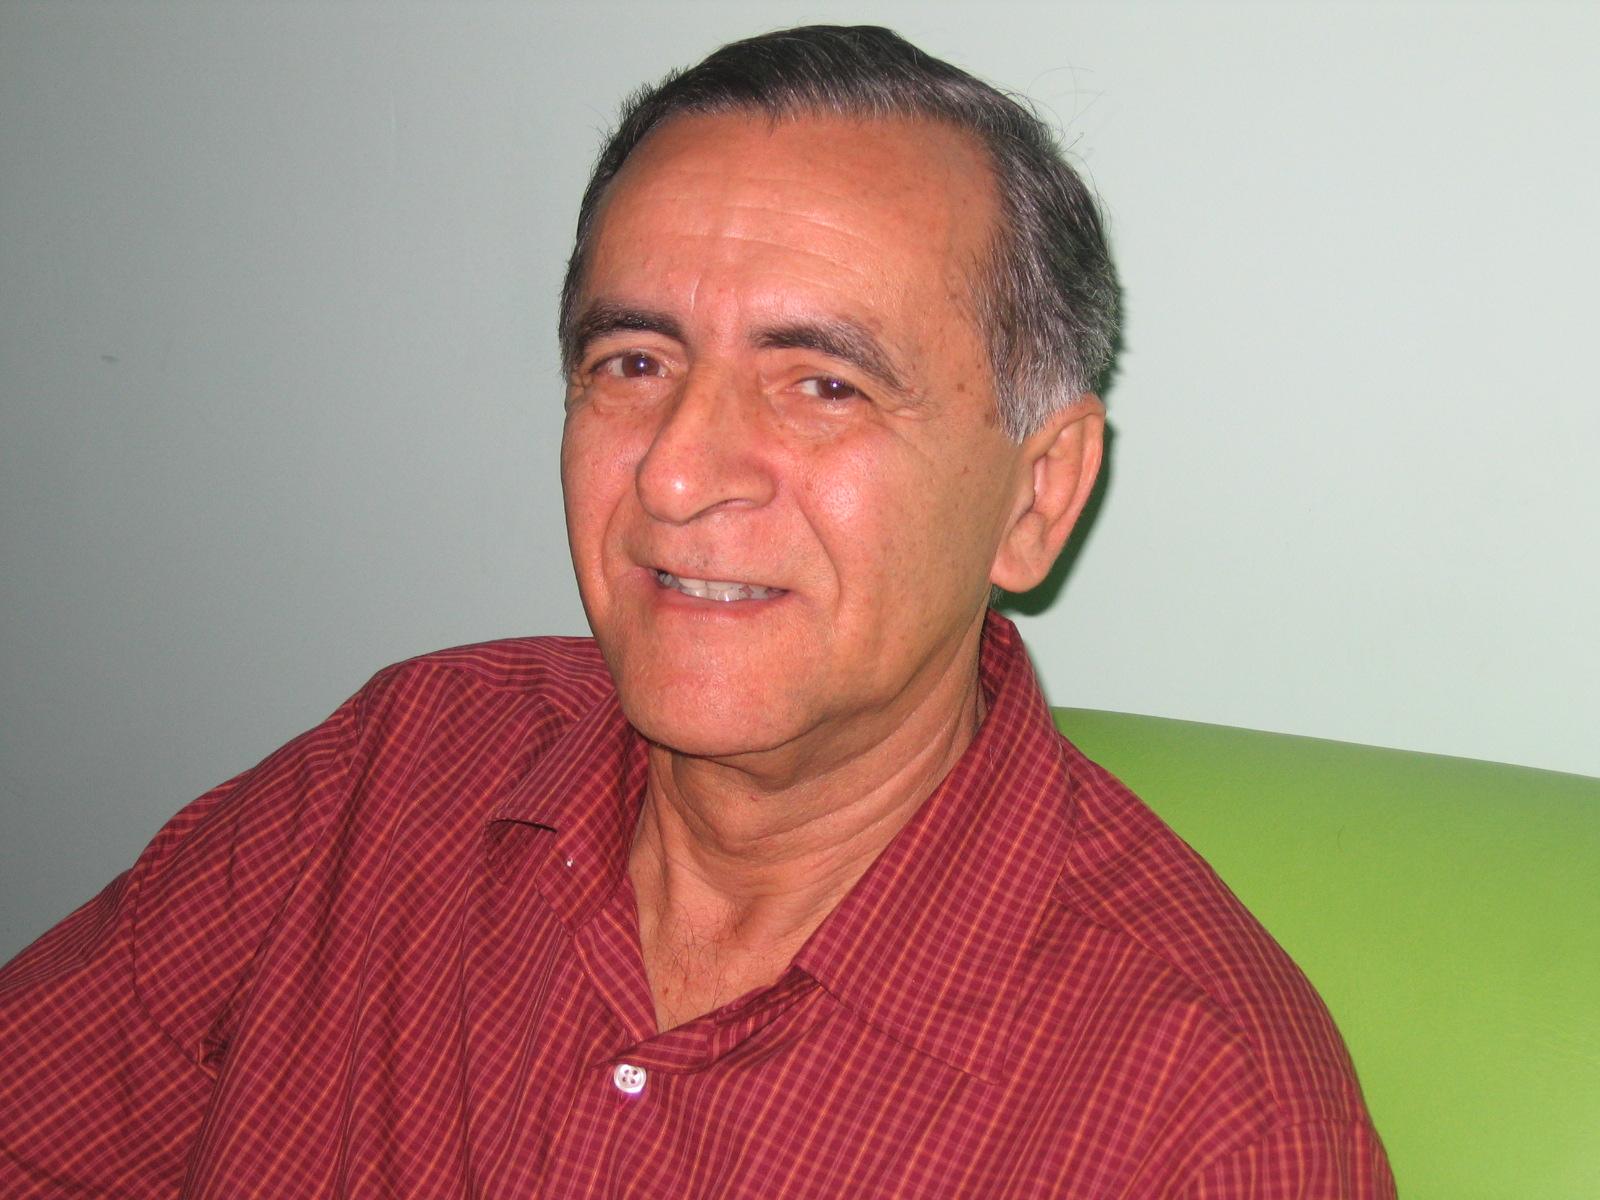 João Otávio Macedo